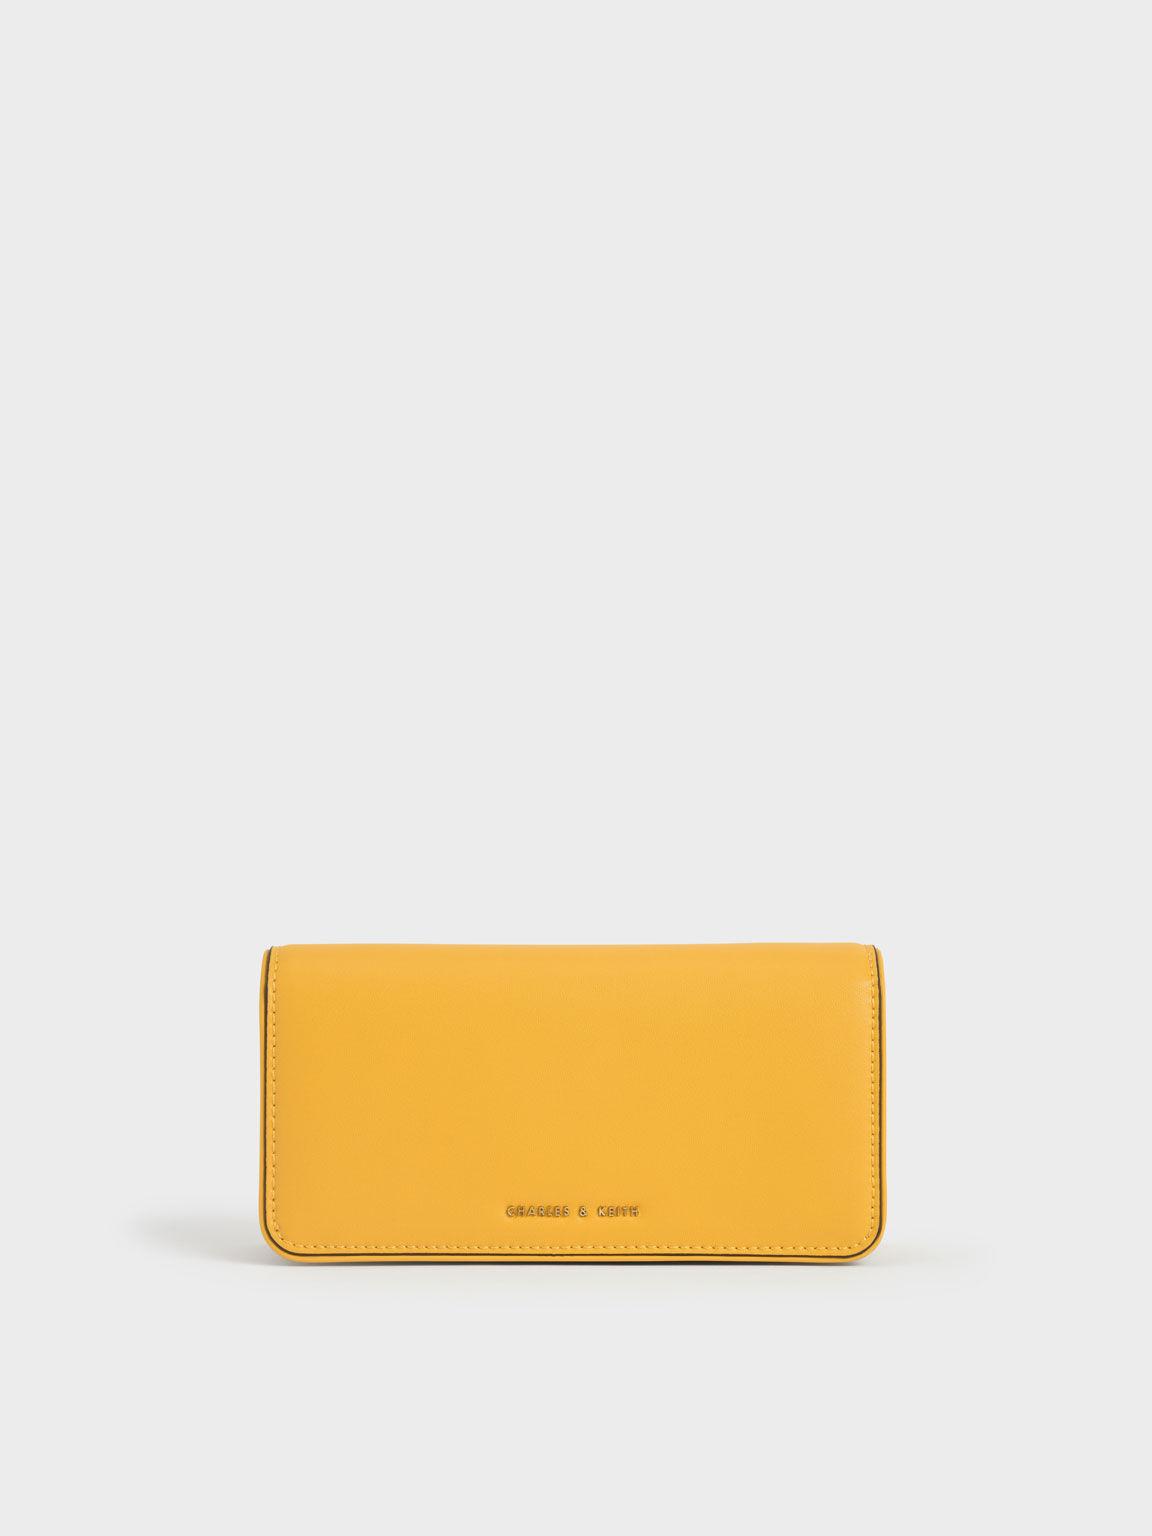 Push-Lock Long Wallet, Yellow, hi-res